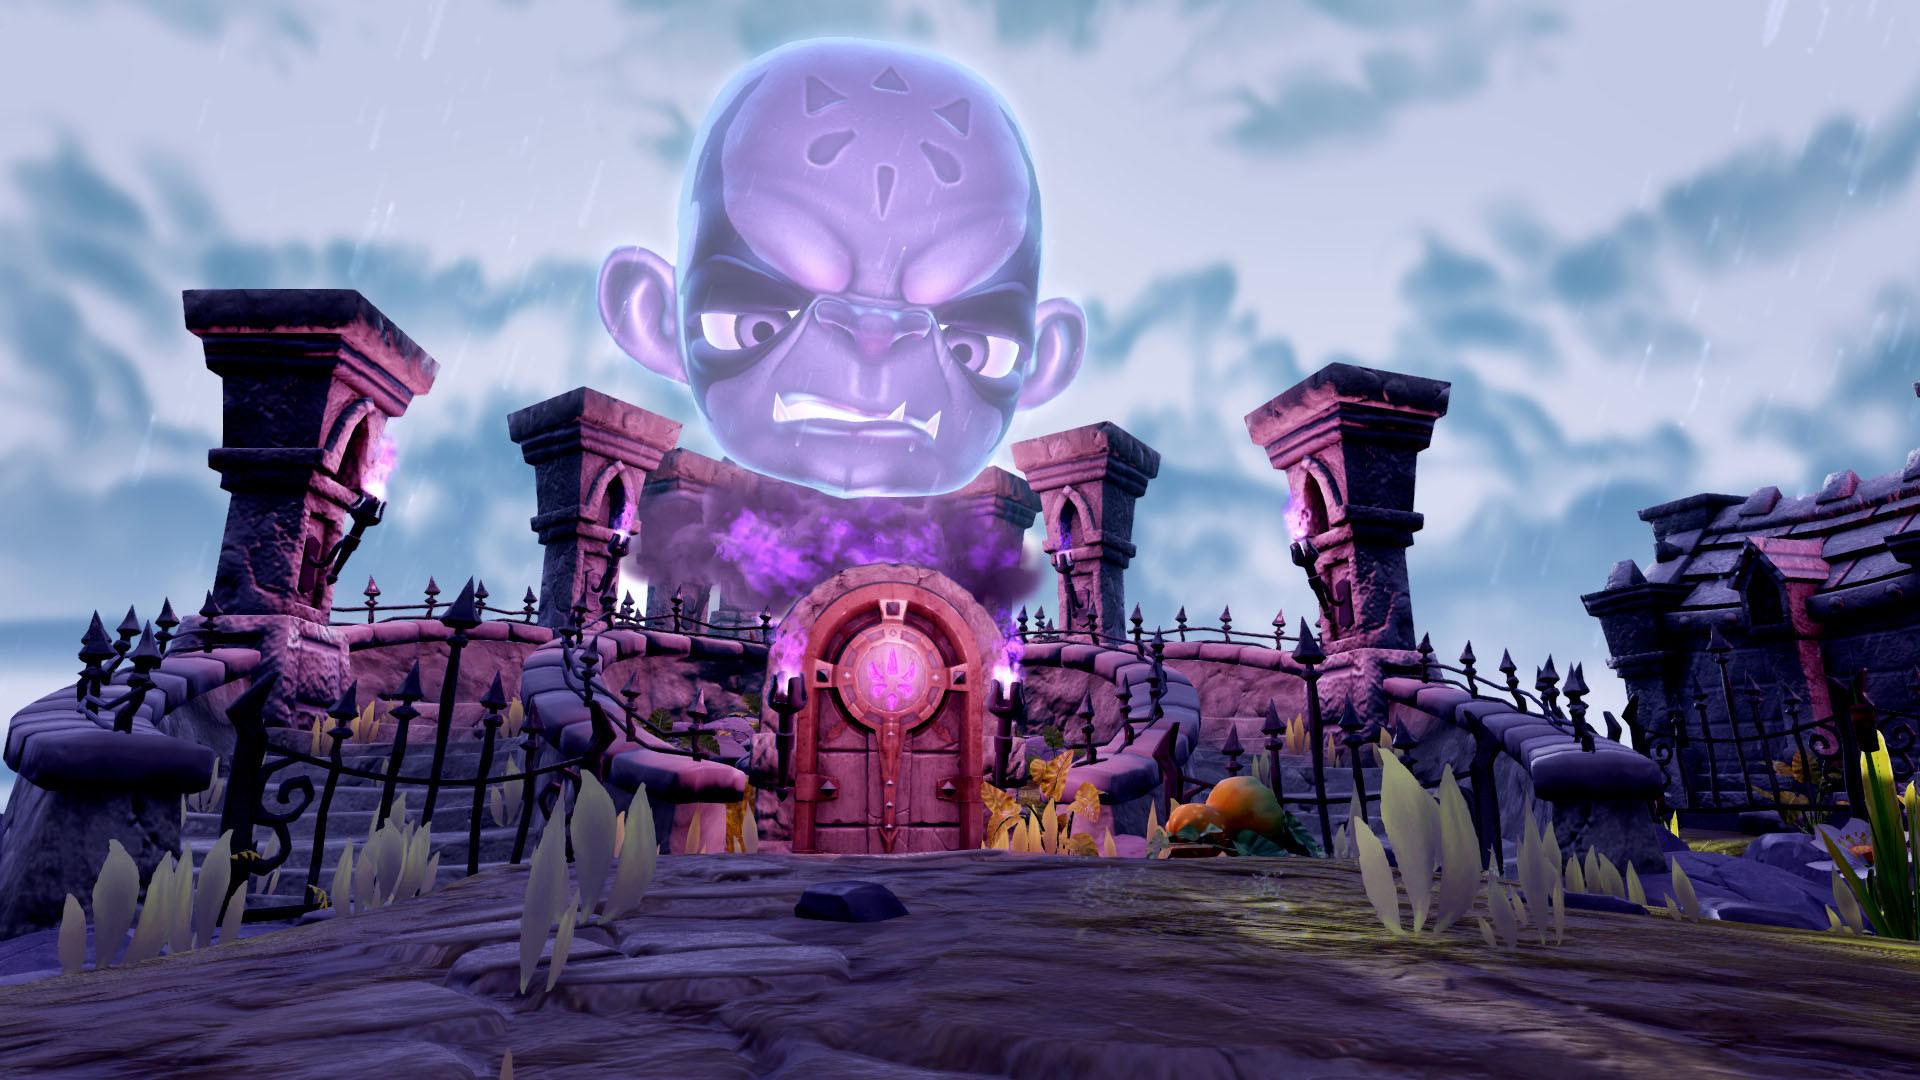 Skylanders: Trap Team – Kaos Doom Challenge Mode wallpaper